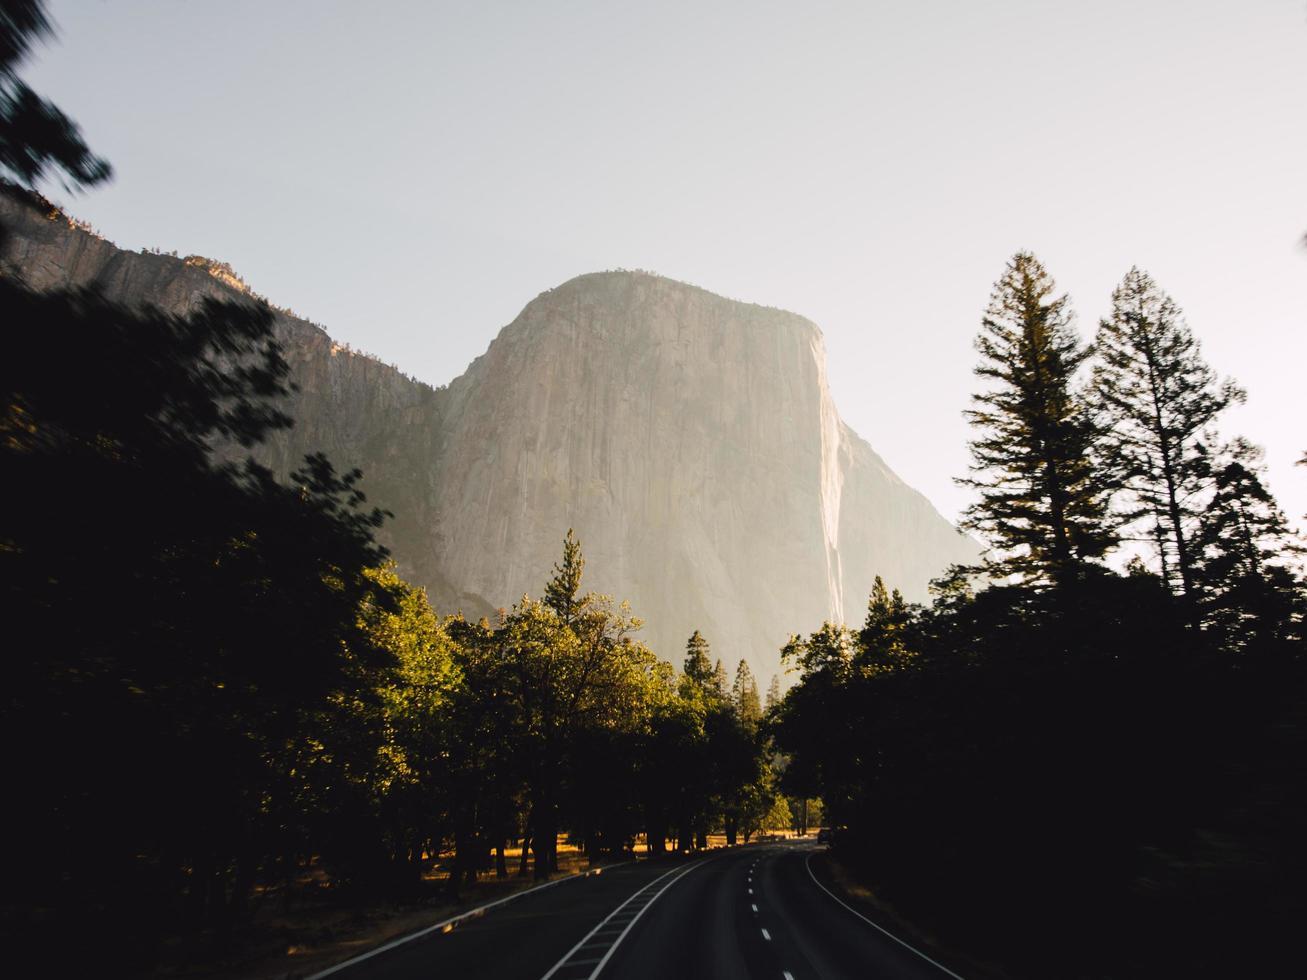 El Capitan at sunrise in Yosemite photo